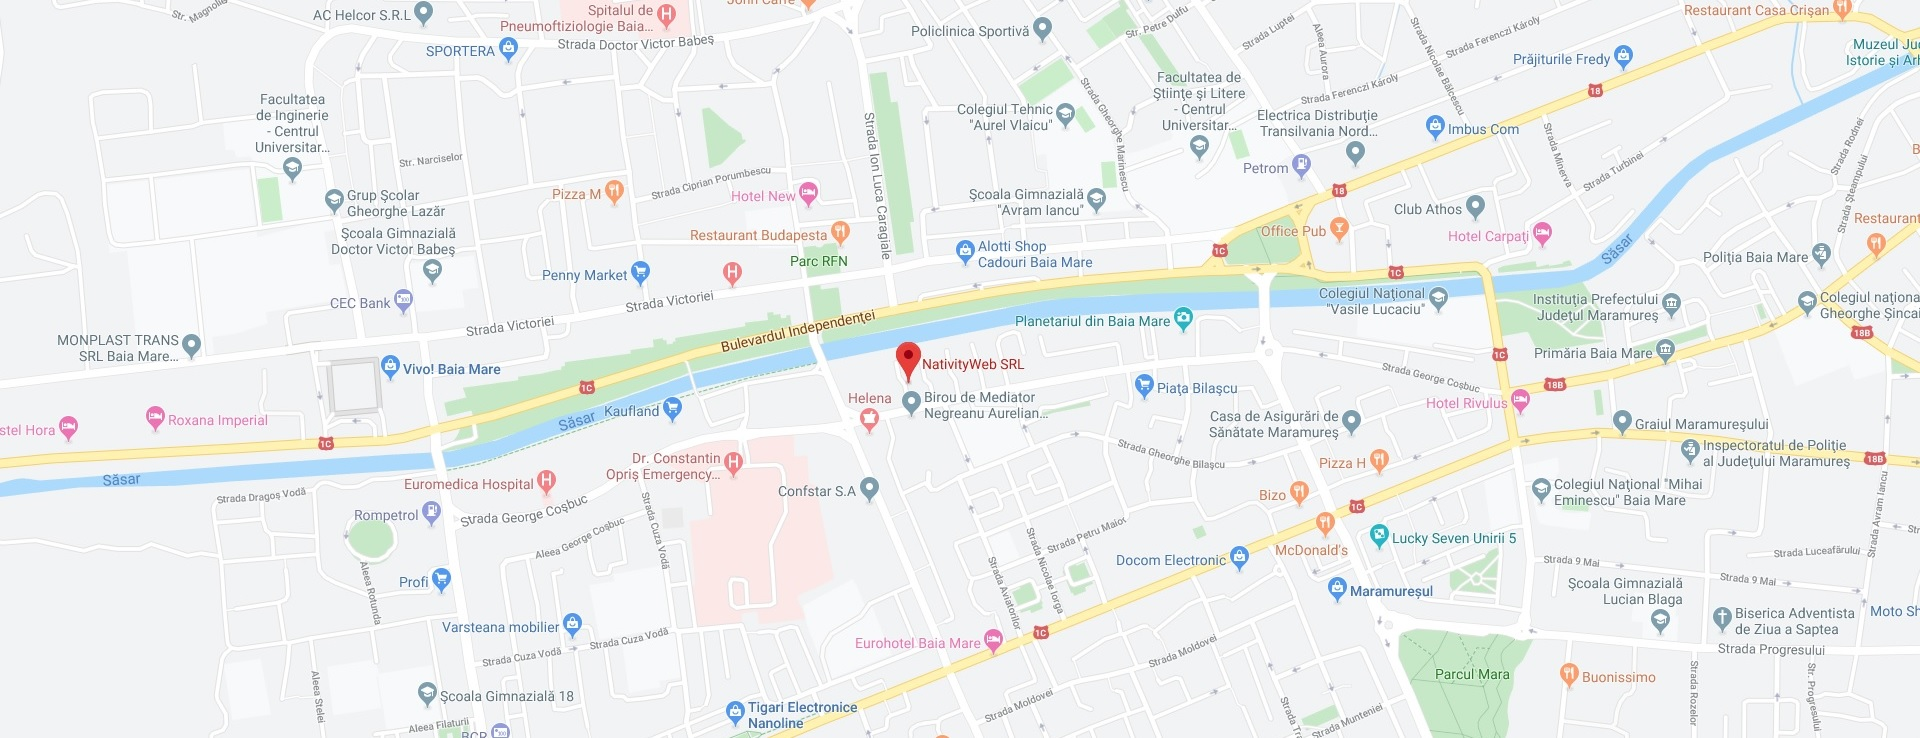 NativityWeb Google Map Location